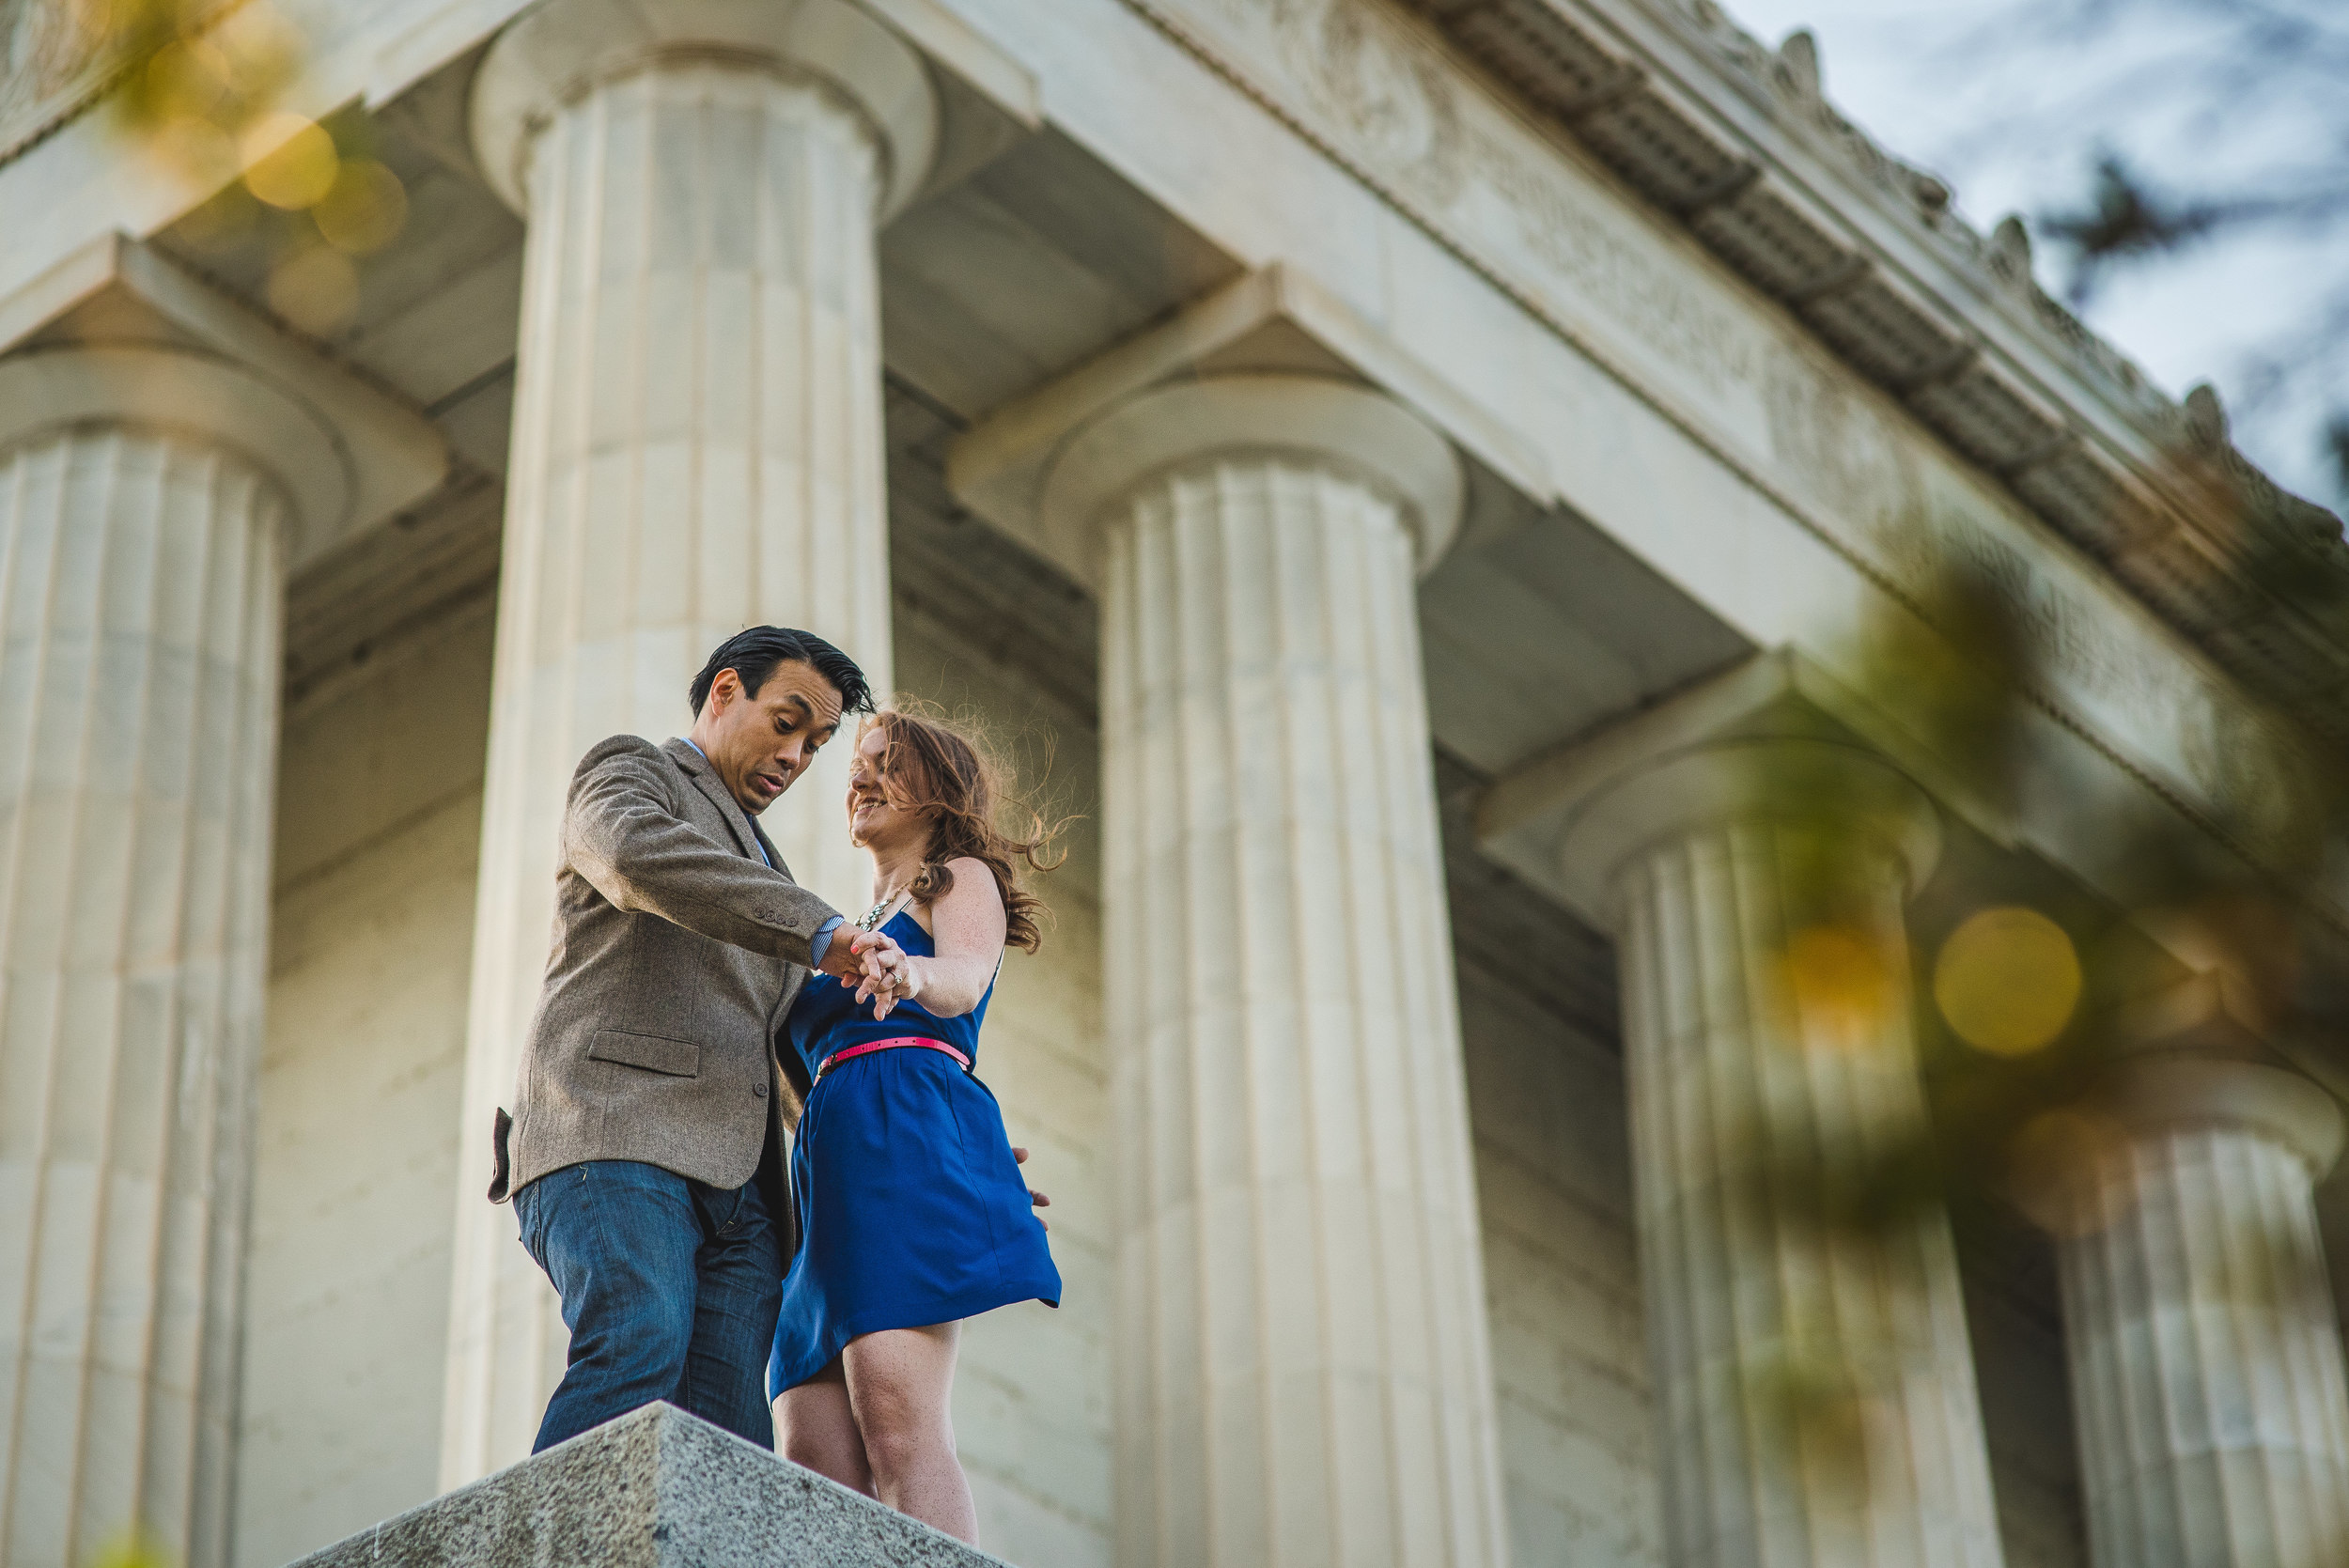 Best Engagement Photographer Washington DC Mantas Kubilinskas-15.jpg